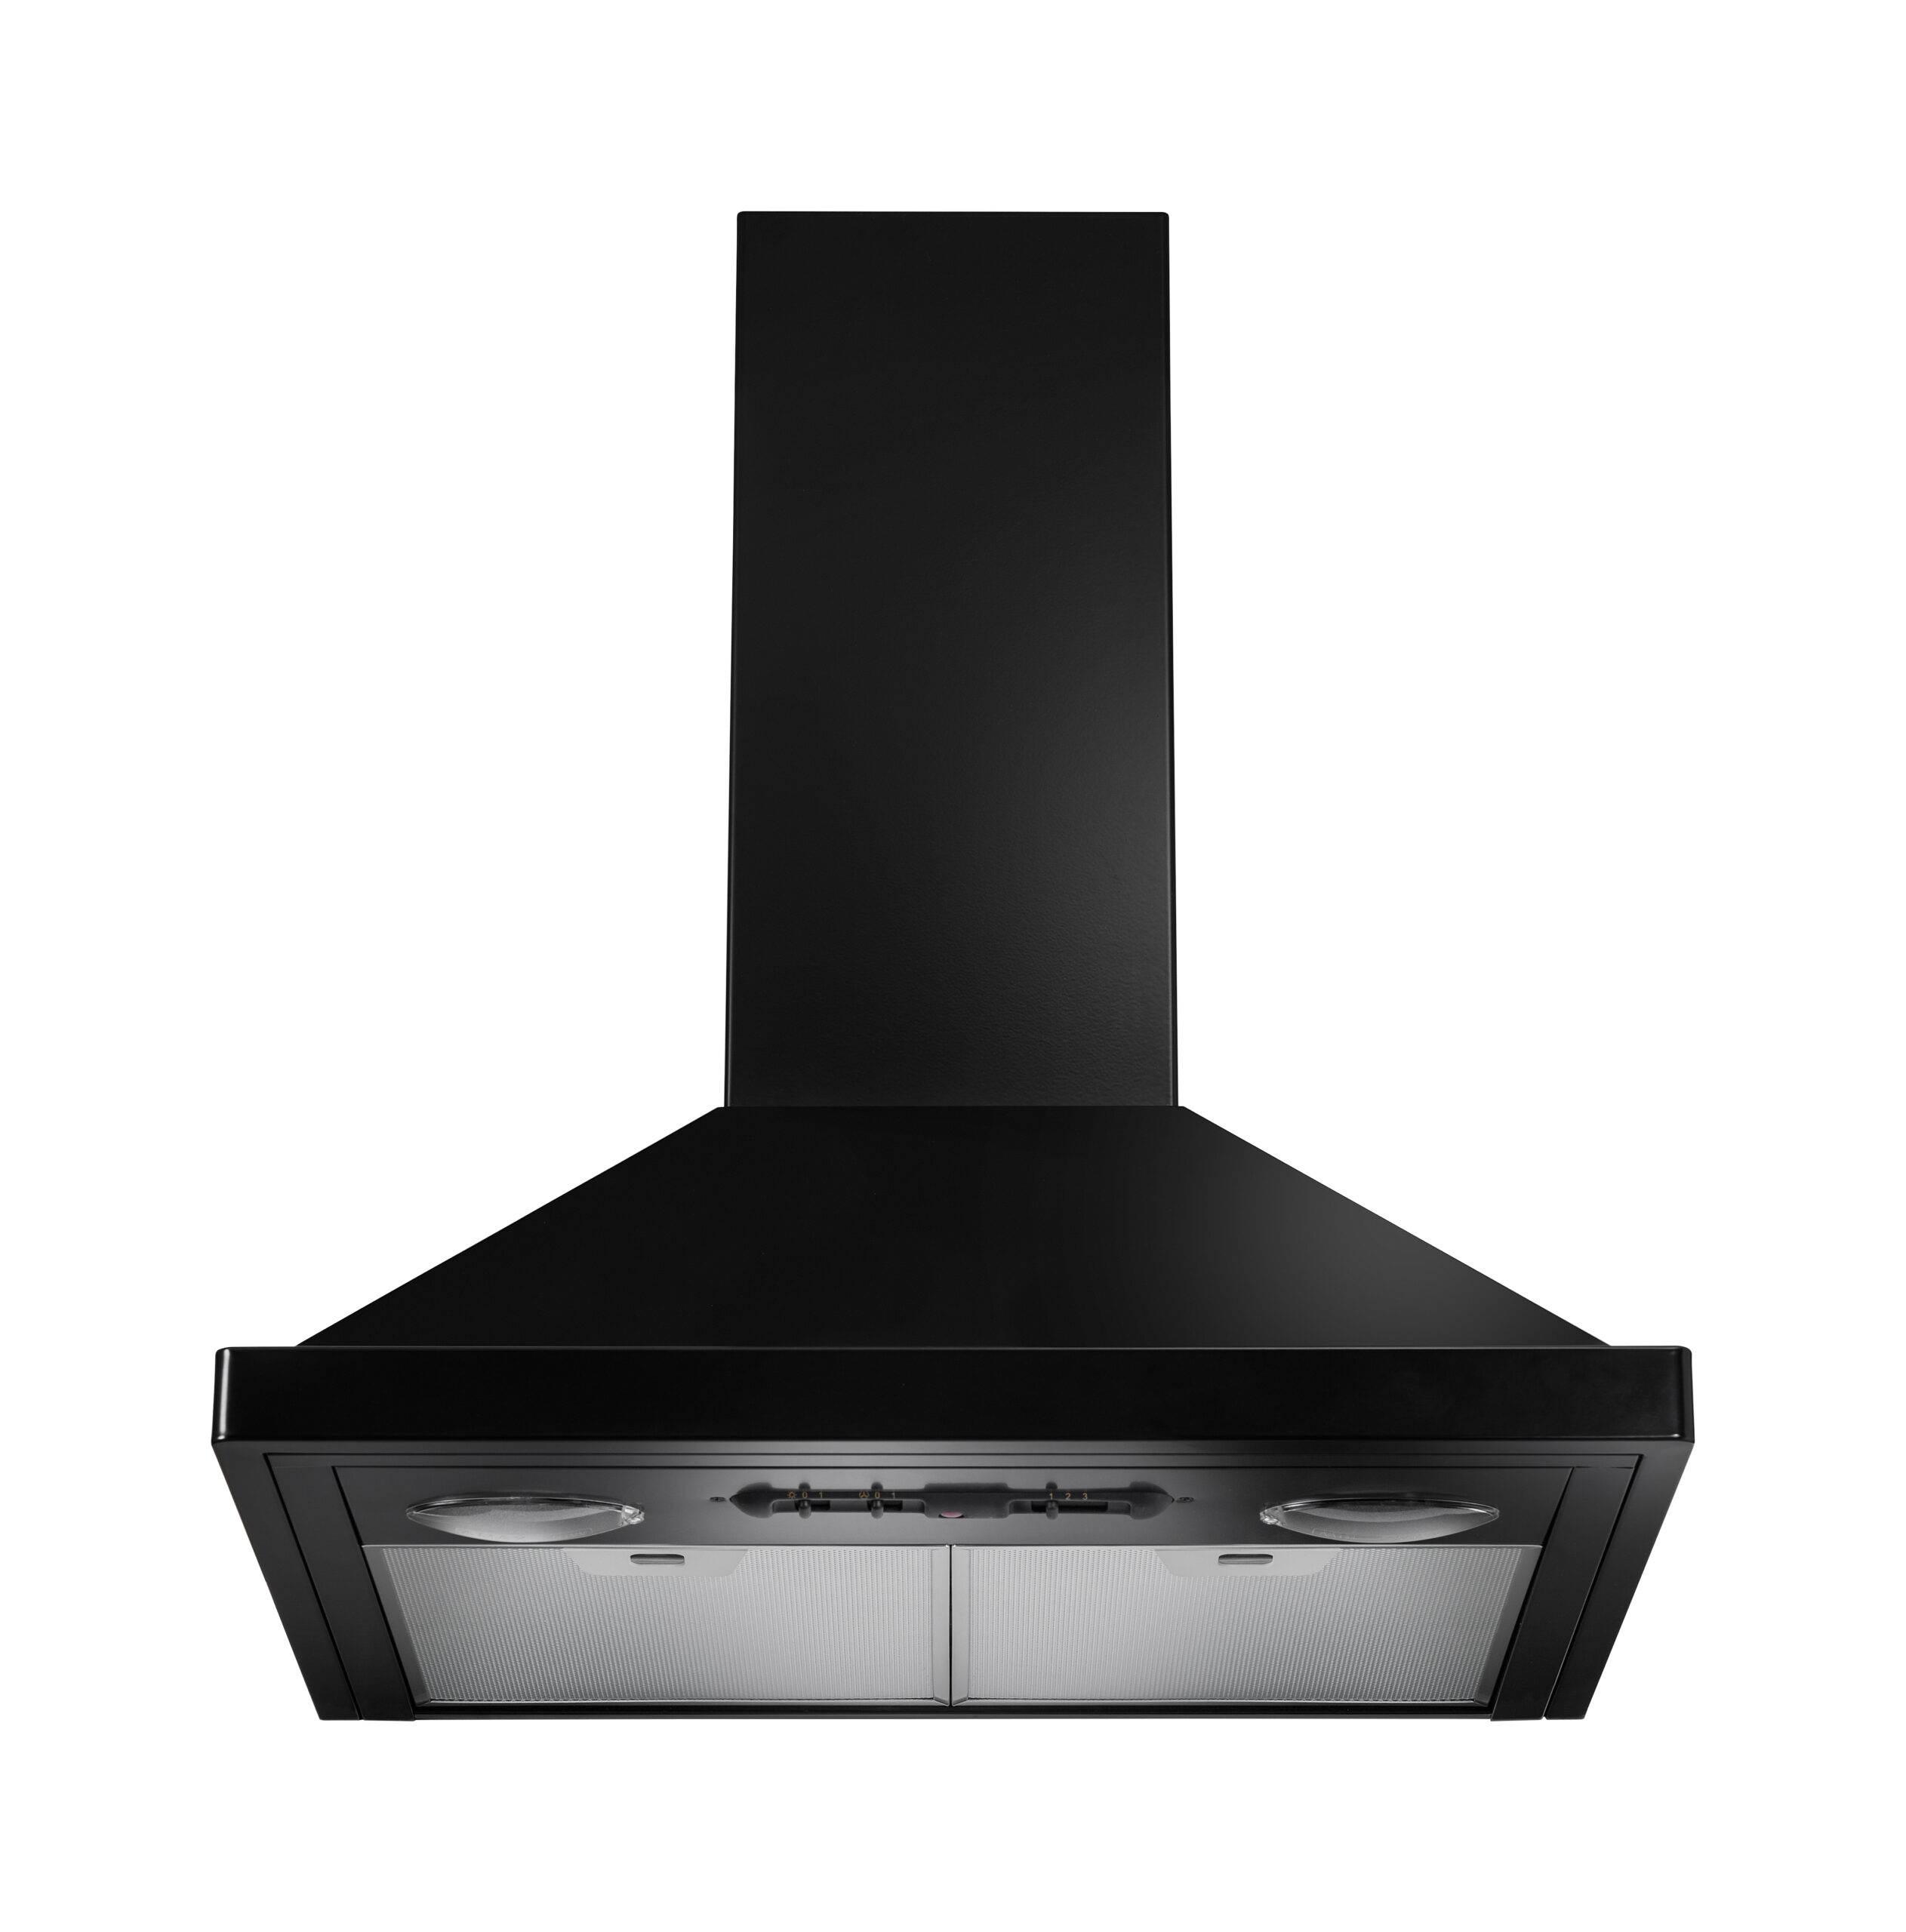 AGA 60cm Cooker Hood - Black